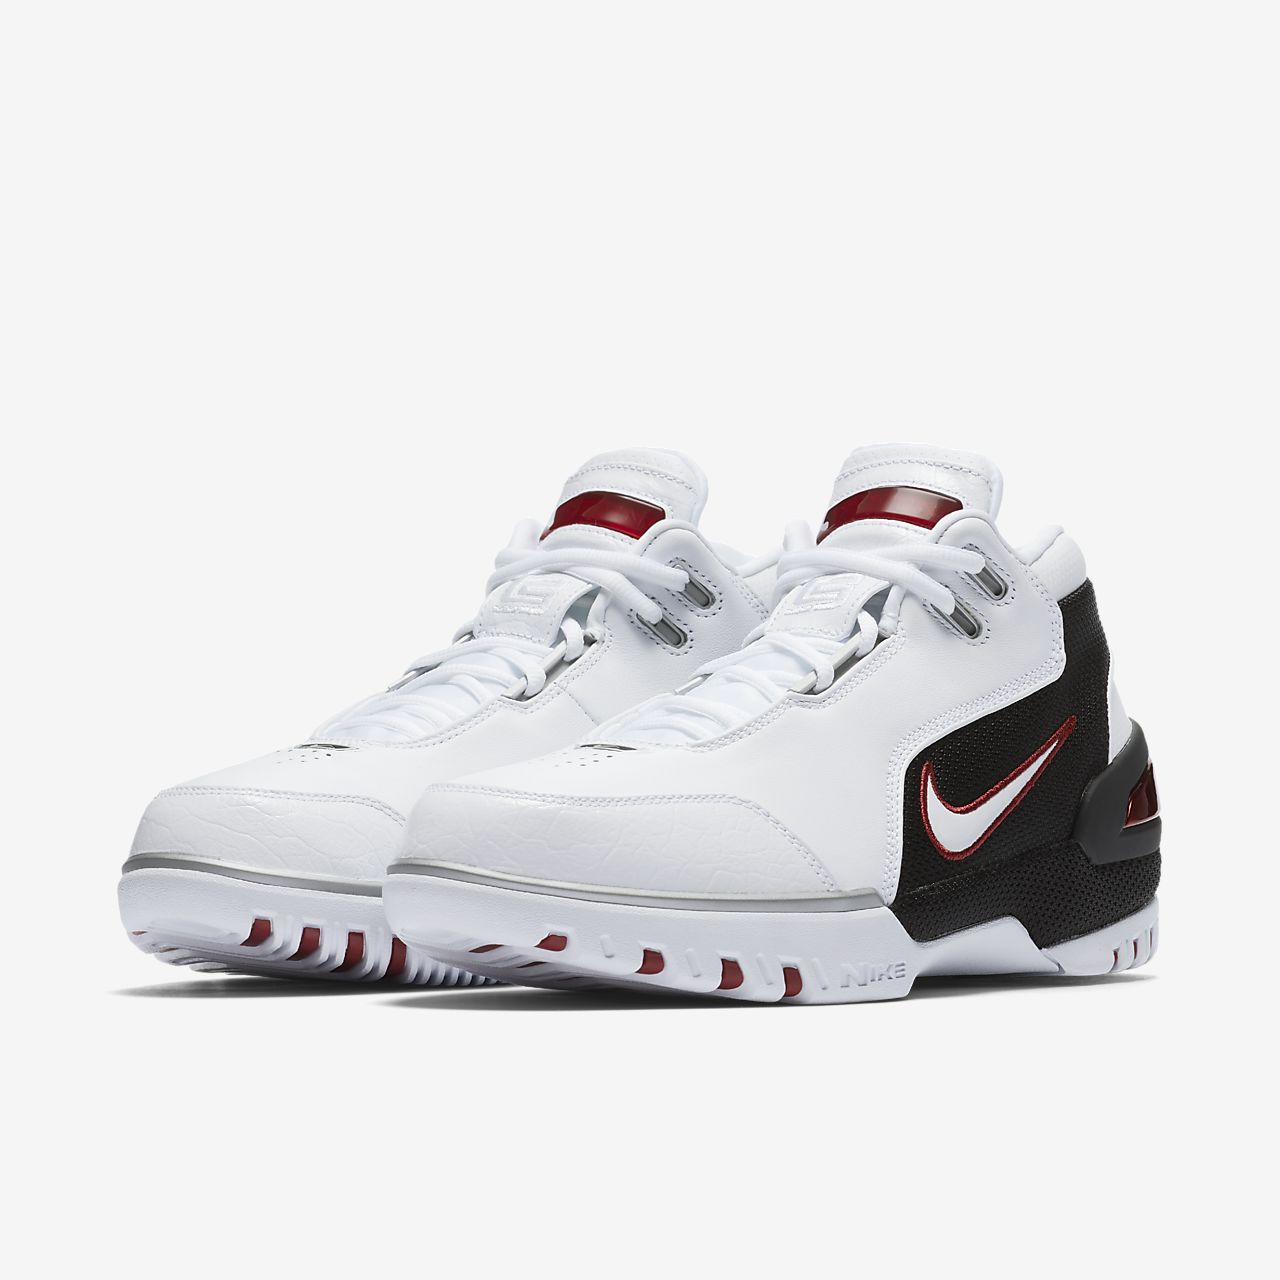 size 40 8be67 d67f6 ... Scarpa da basket Nike Air Zoom Generation QS - Uomo